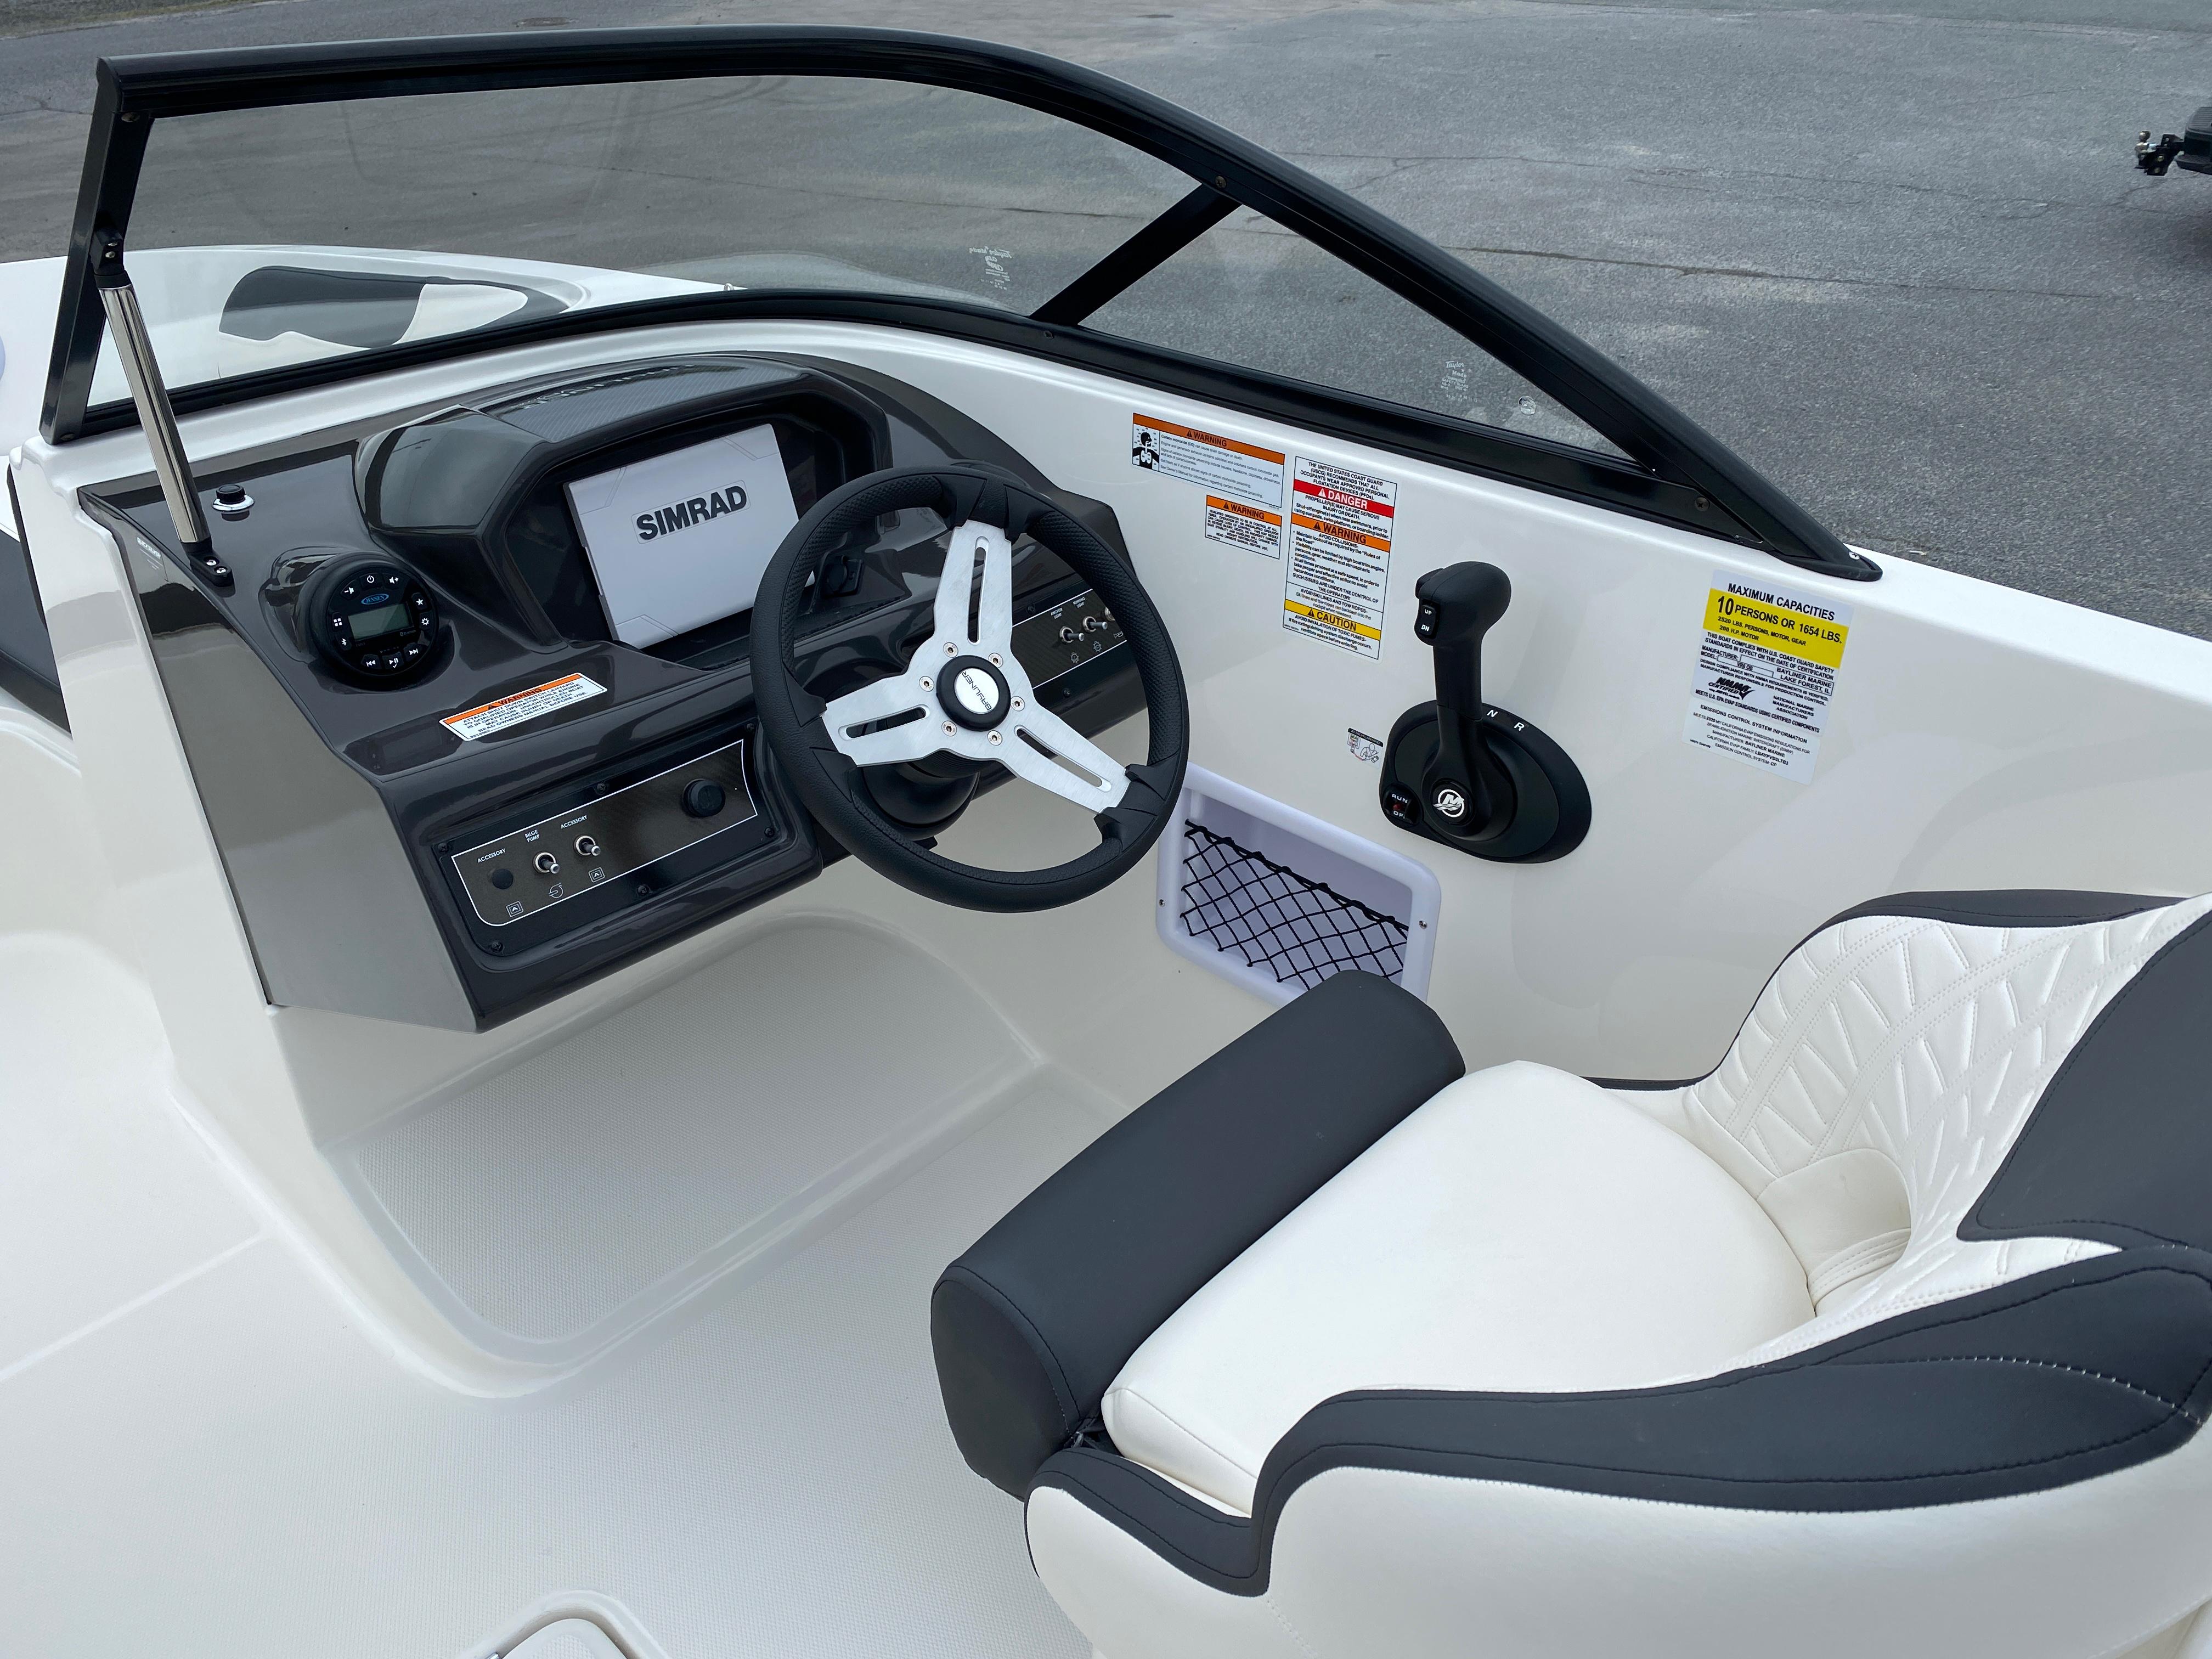 2020 Bayliner boat for sale, model of the boat is VR6 Bowrider & Image # 12 of 14